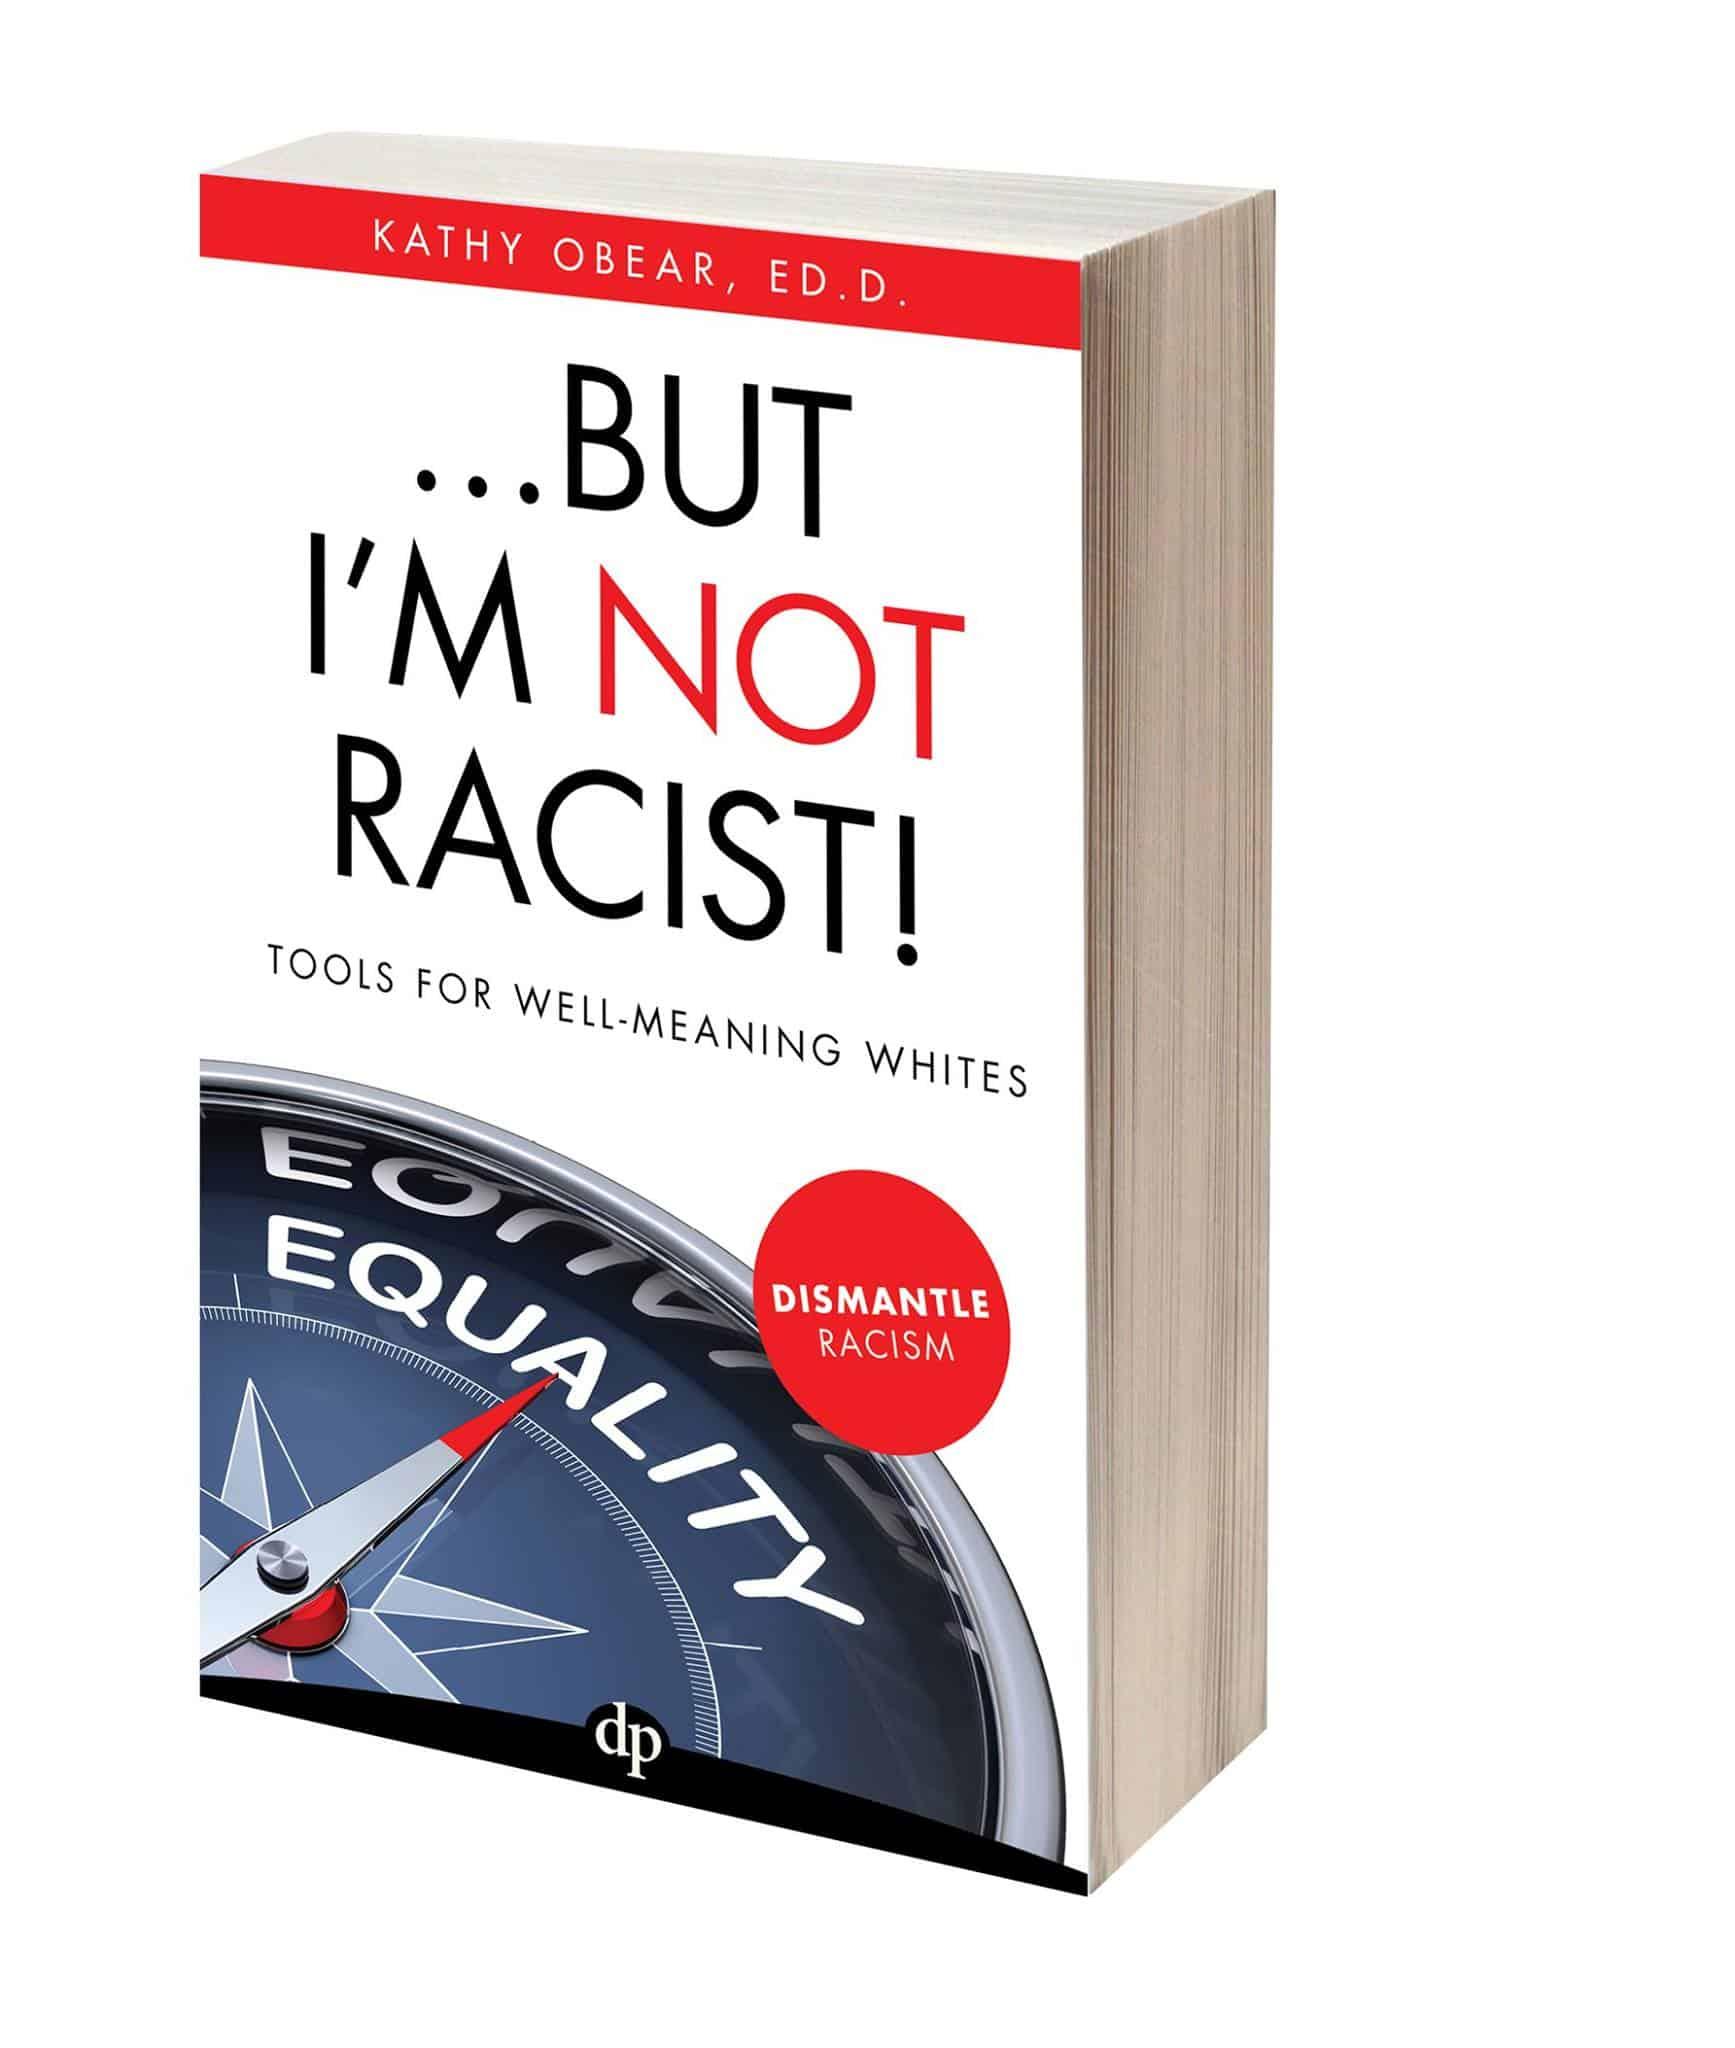 I'm not racist